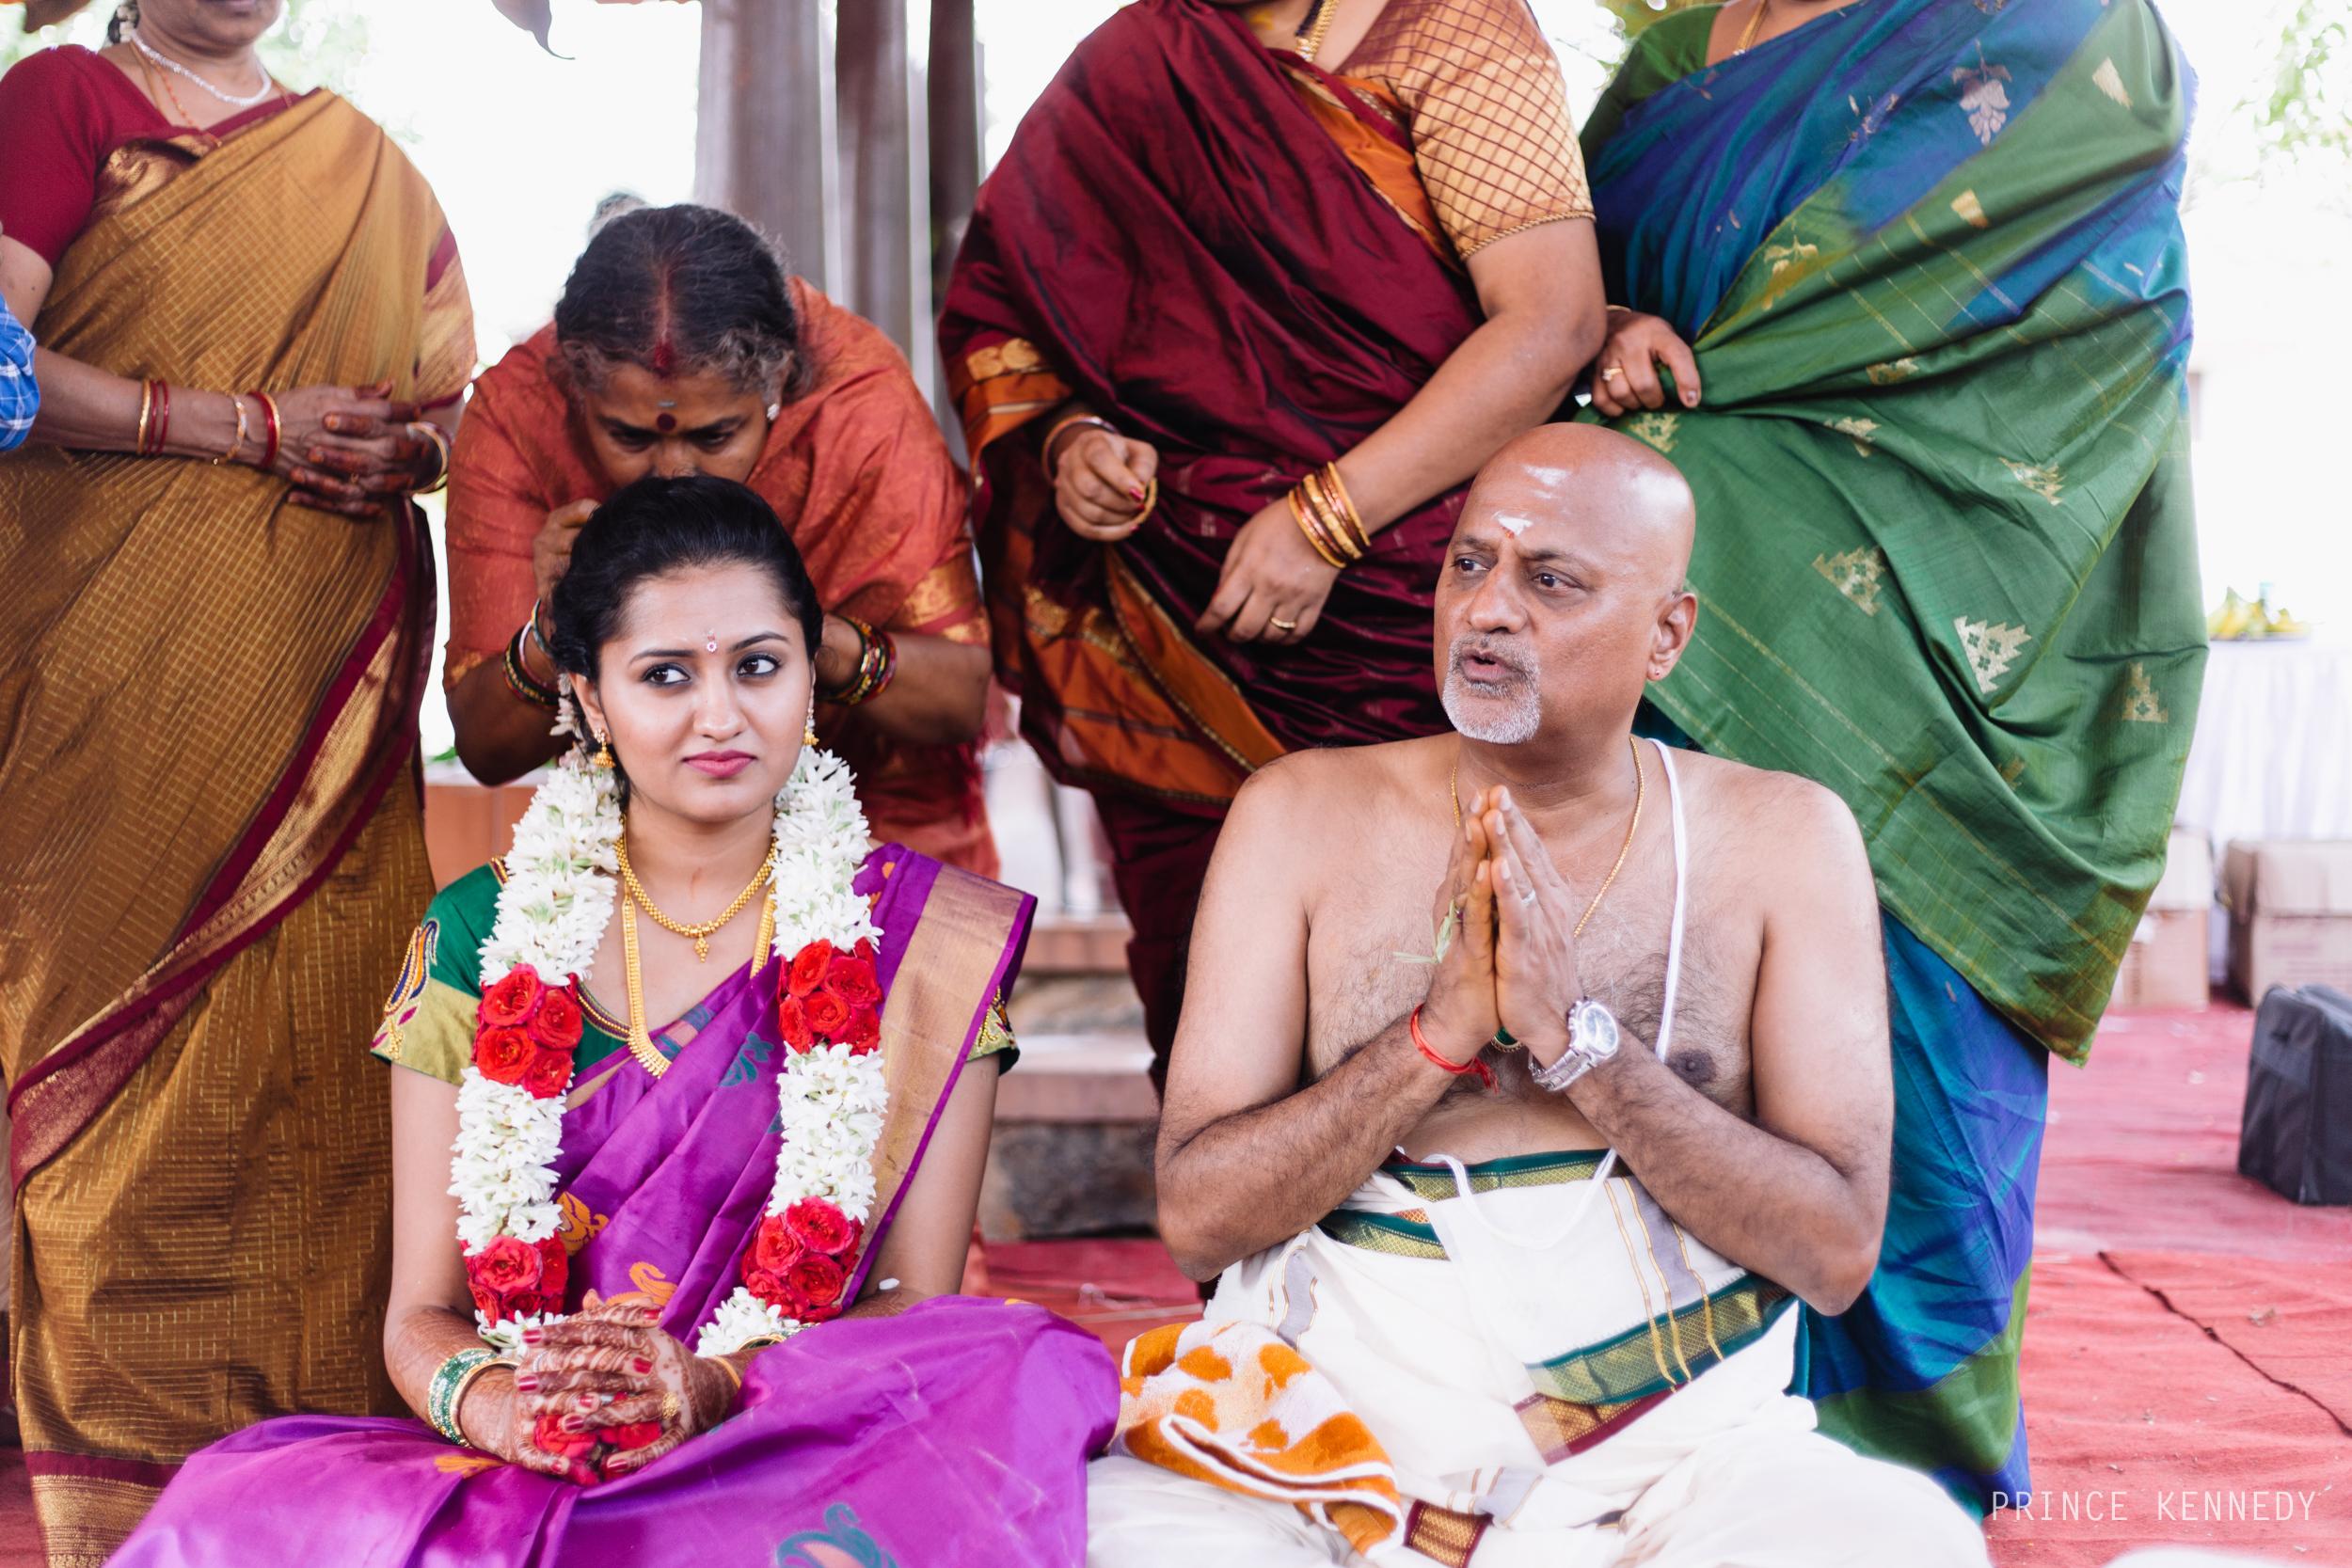 Athmajja-Nithesh-Engagement-Couple-Portrait-Portraiture-Wedding-Couple-Portrait-Chennai-Photographer-Candid-Photography-Destination-Best-Prince-Kennedy-Photography-134.jpg